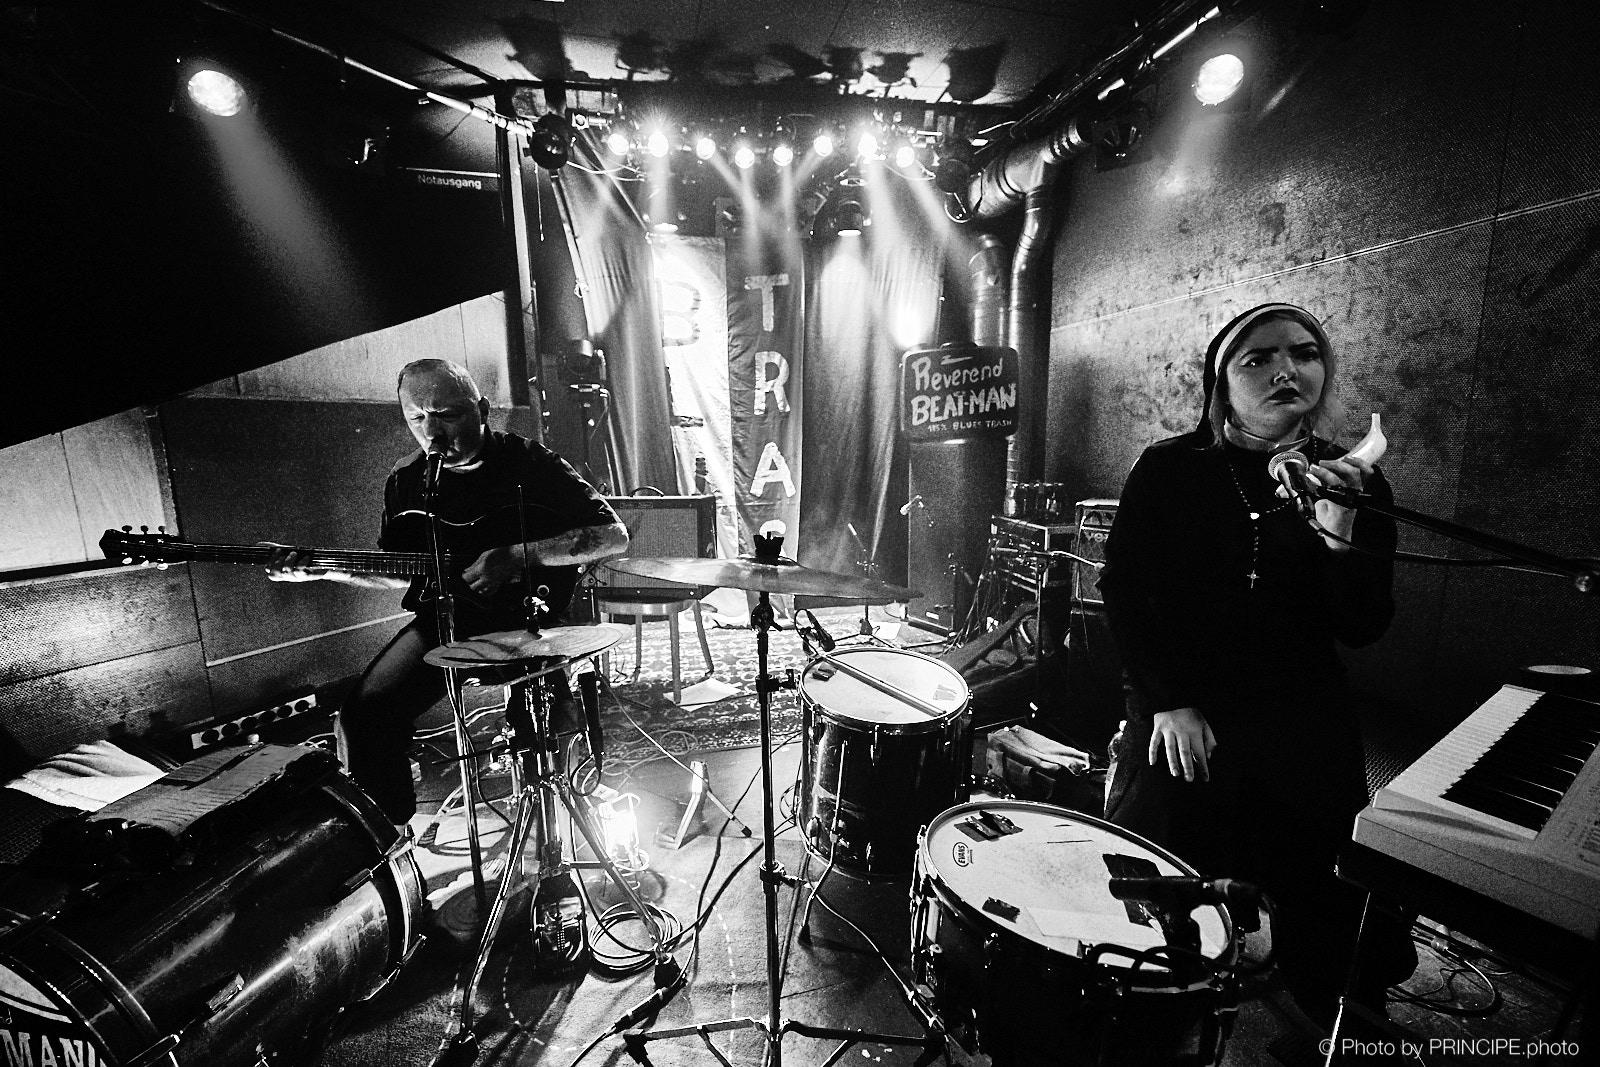 Reverend Beat-Man & Izobel Garcia @ Gaswerk